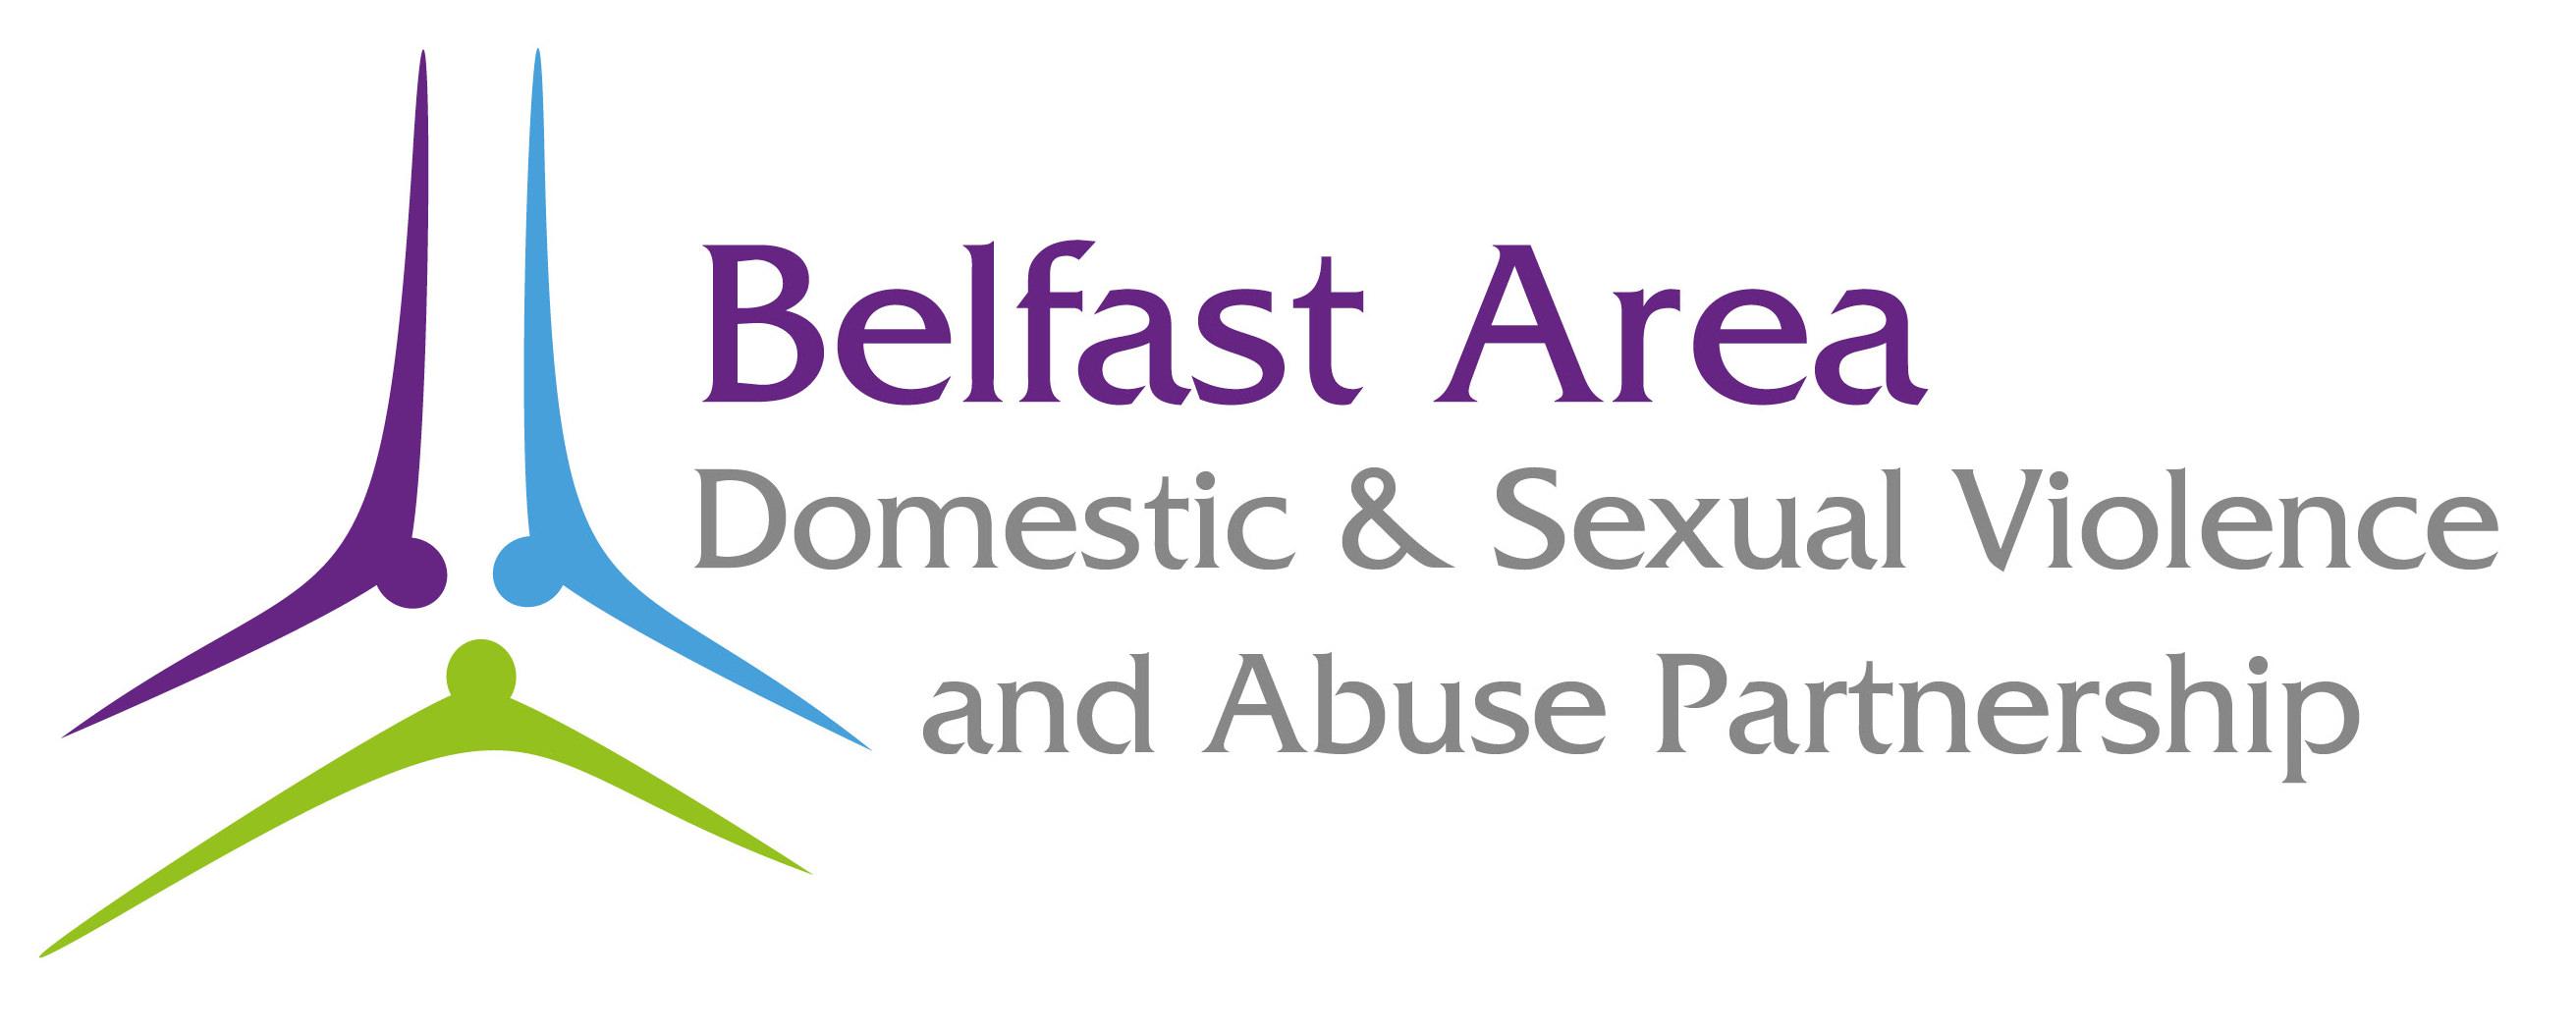 Belfast Area Domestic Violence Partnership